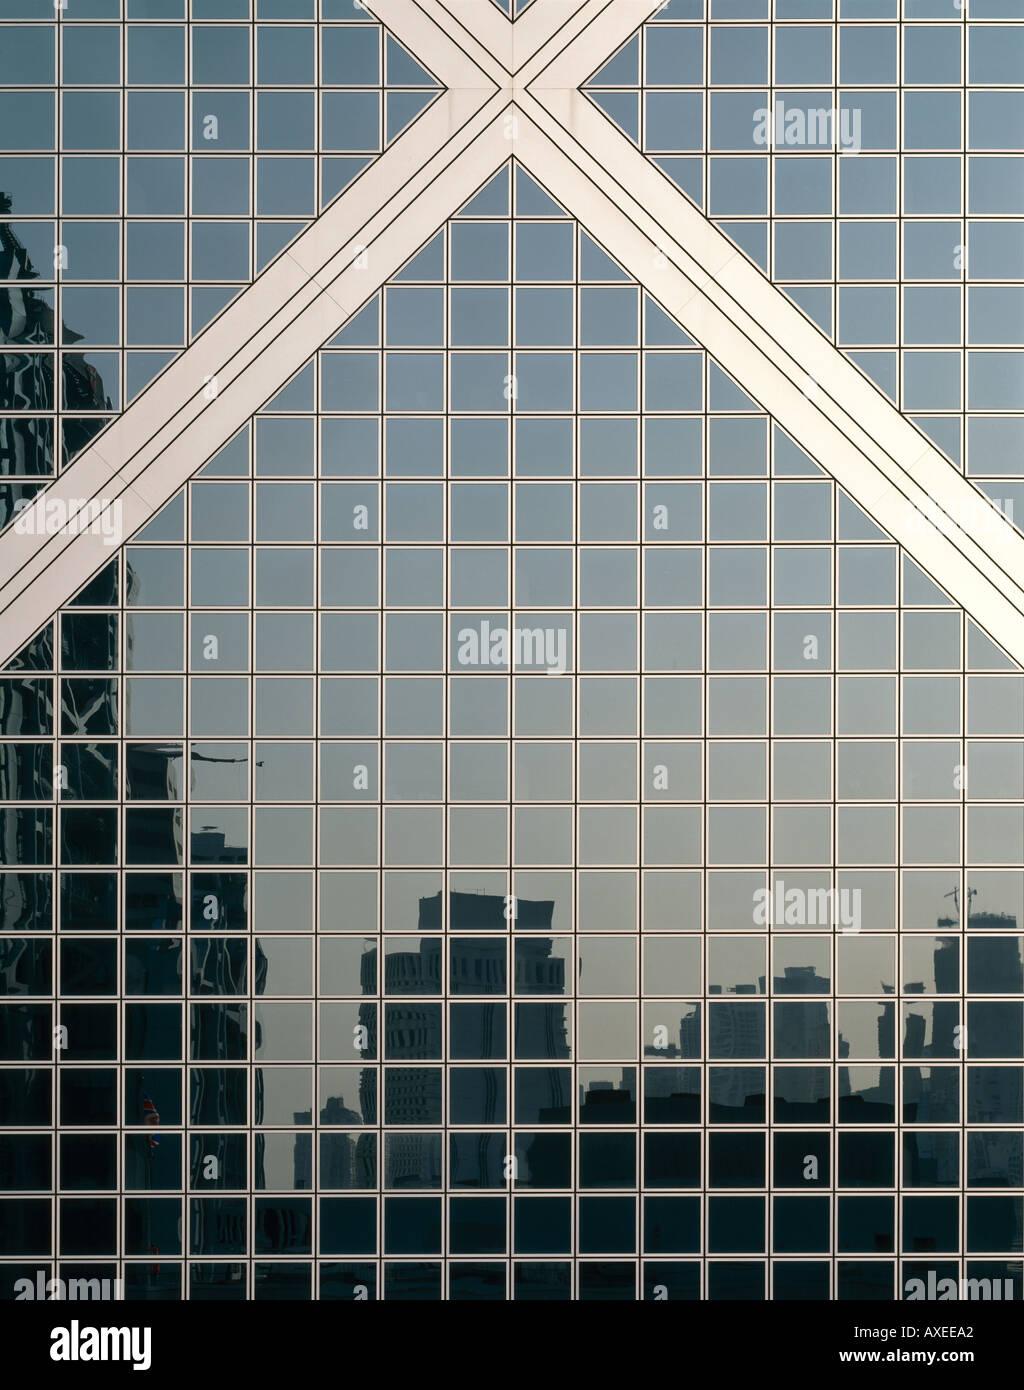 Bank of China, Hong Kong, China, 1985-90. Äußere Detail. Architekt: Pei, Cobb und befreite Architekten Stockbild